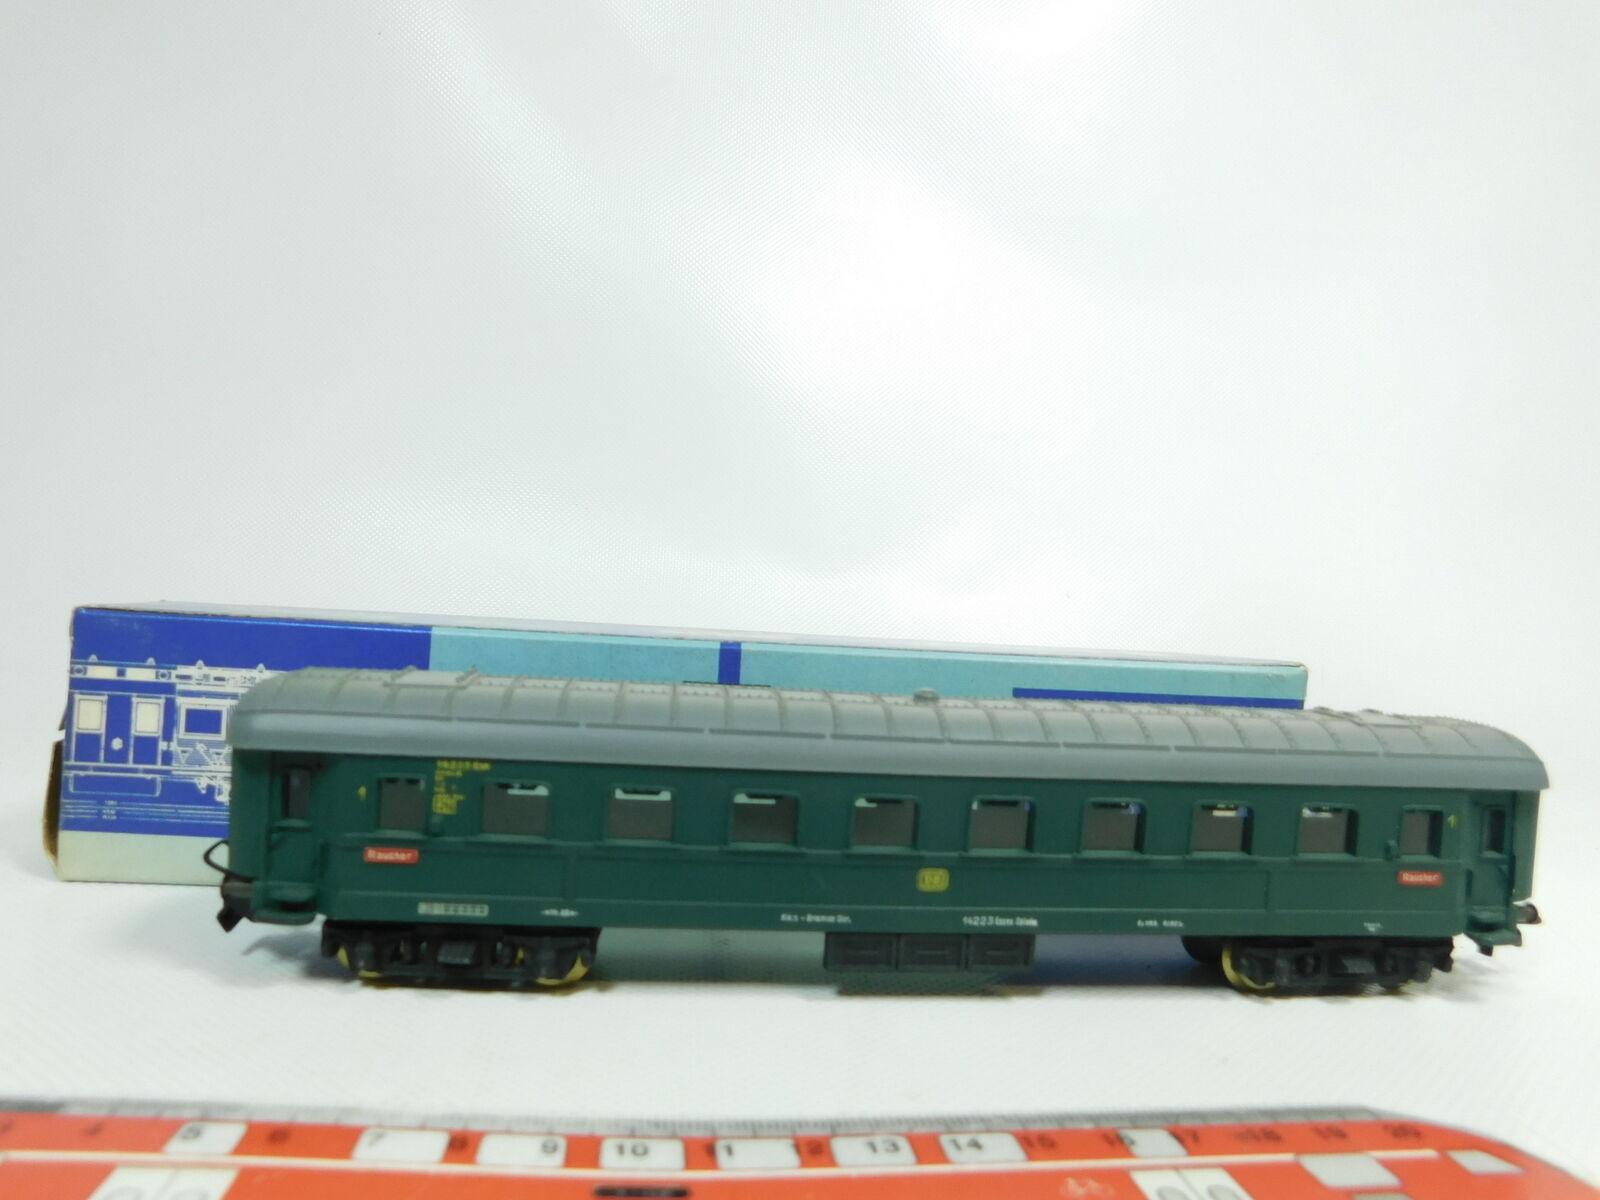 Bj176-0, 5Pocher h0 ac 202 3 vehículos implicados 1. clase 14223 esh DB, embalaje original